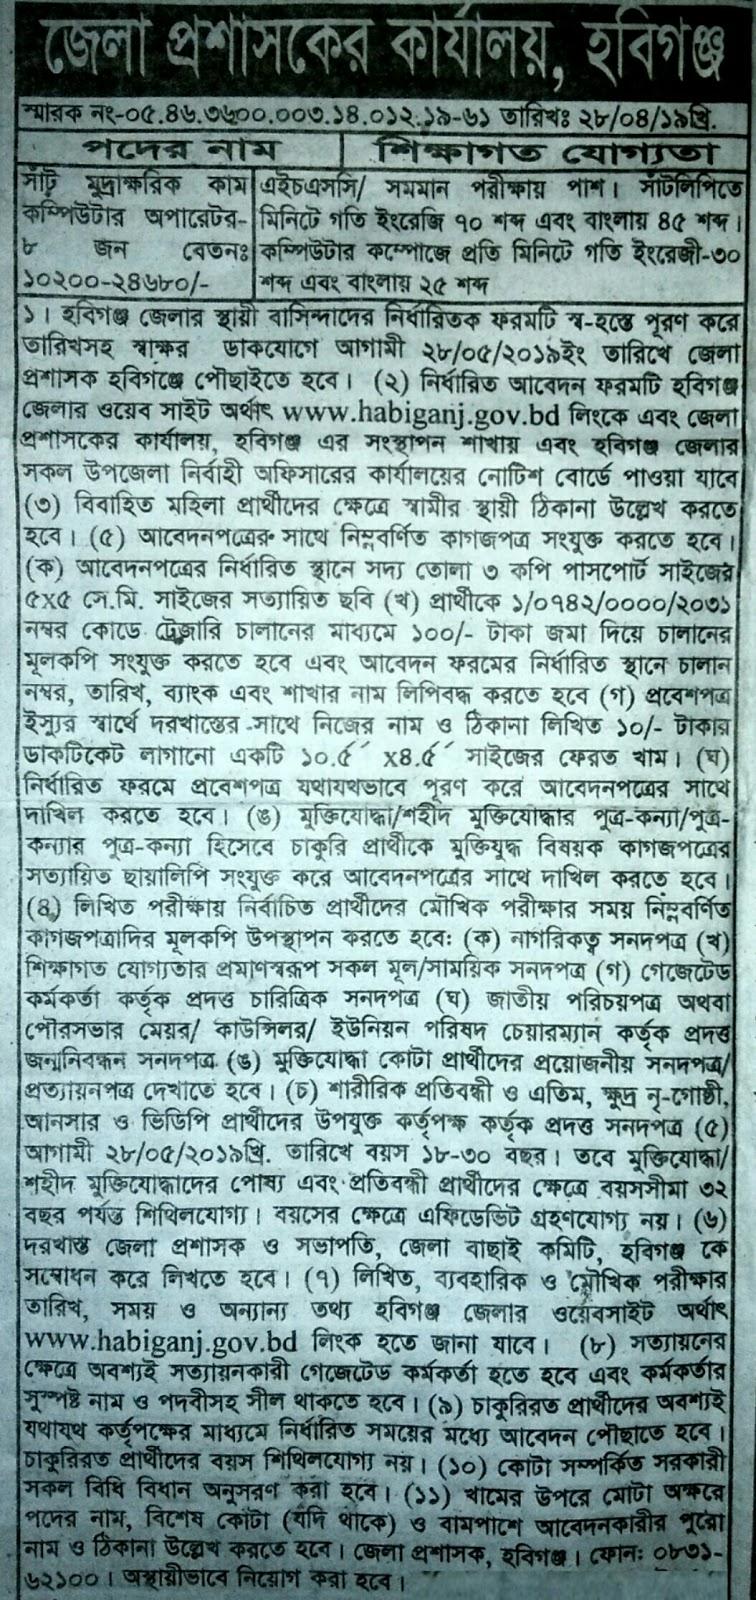 Deputy Commissioner's office, Habiganj job circular 2019. জেলা প্রশাসকের কার্যালয়, হবিগঞ্জ নিয়োগ বিজ্ঞপ্তি ২০১৯